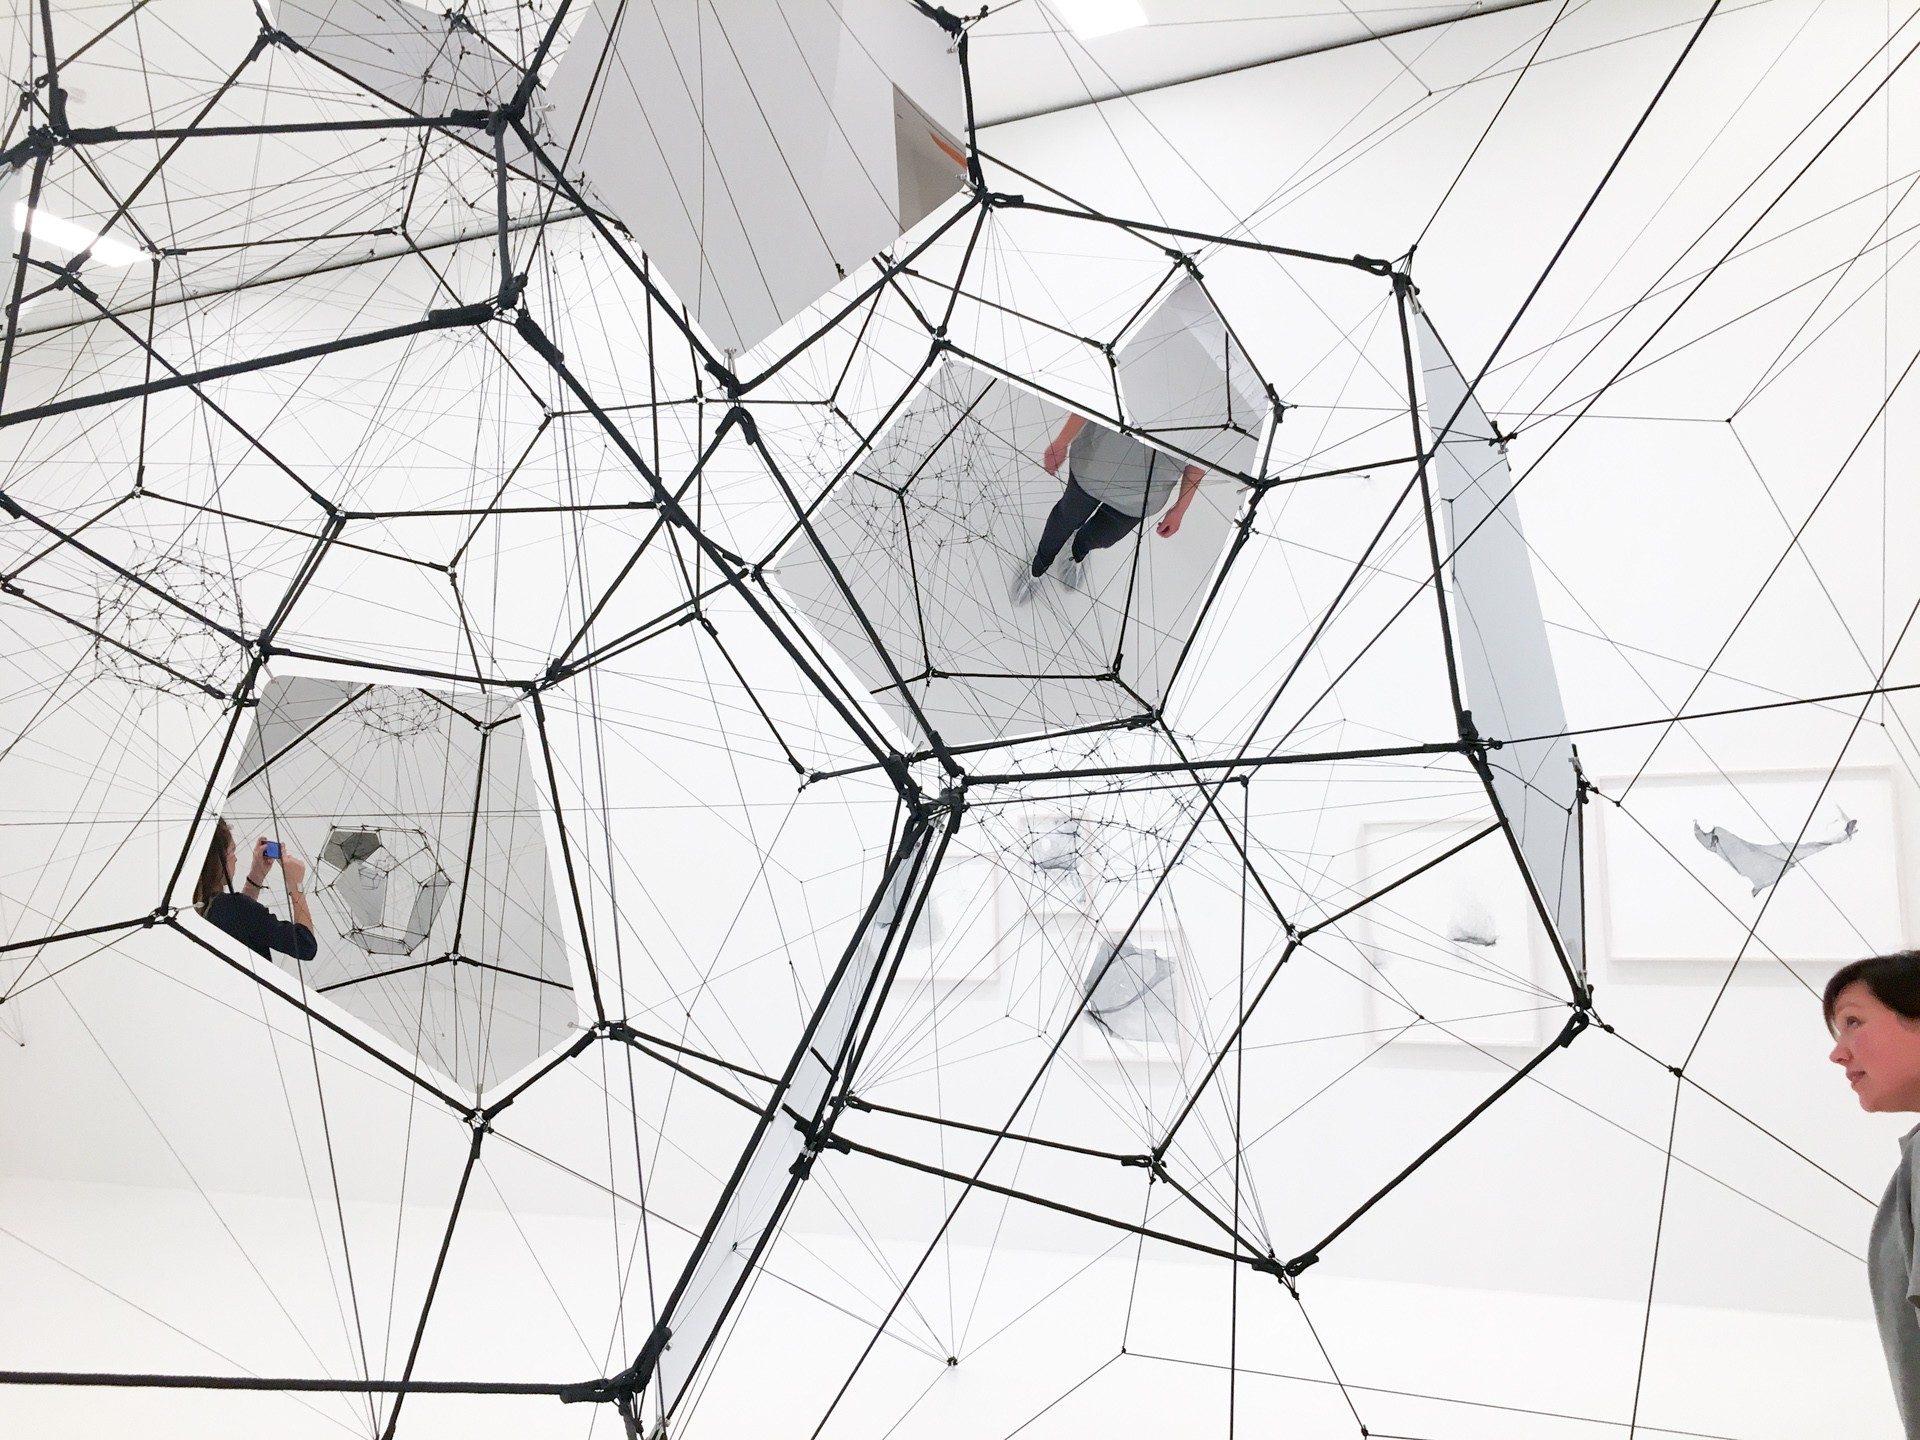 Stillness in Motion – Cloud Cities instalacion